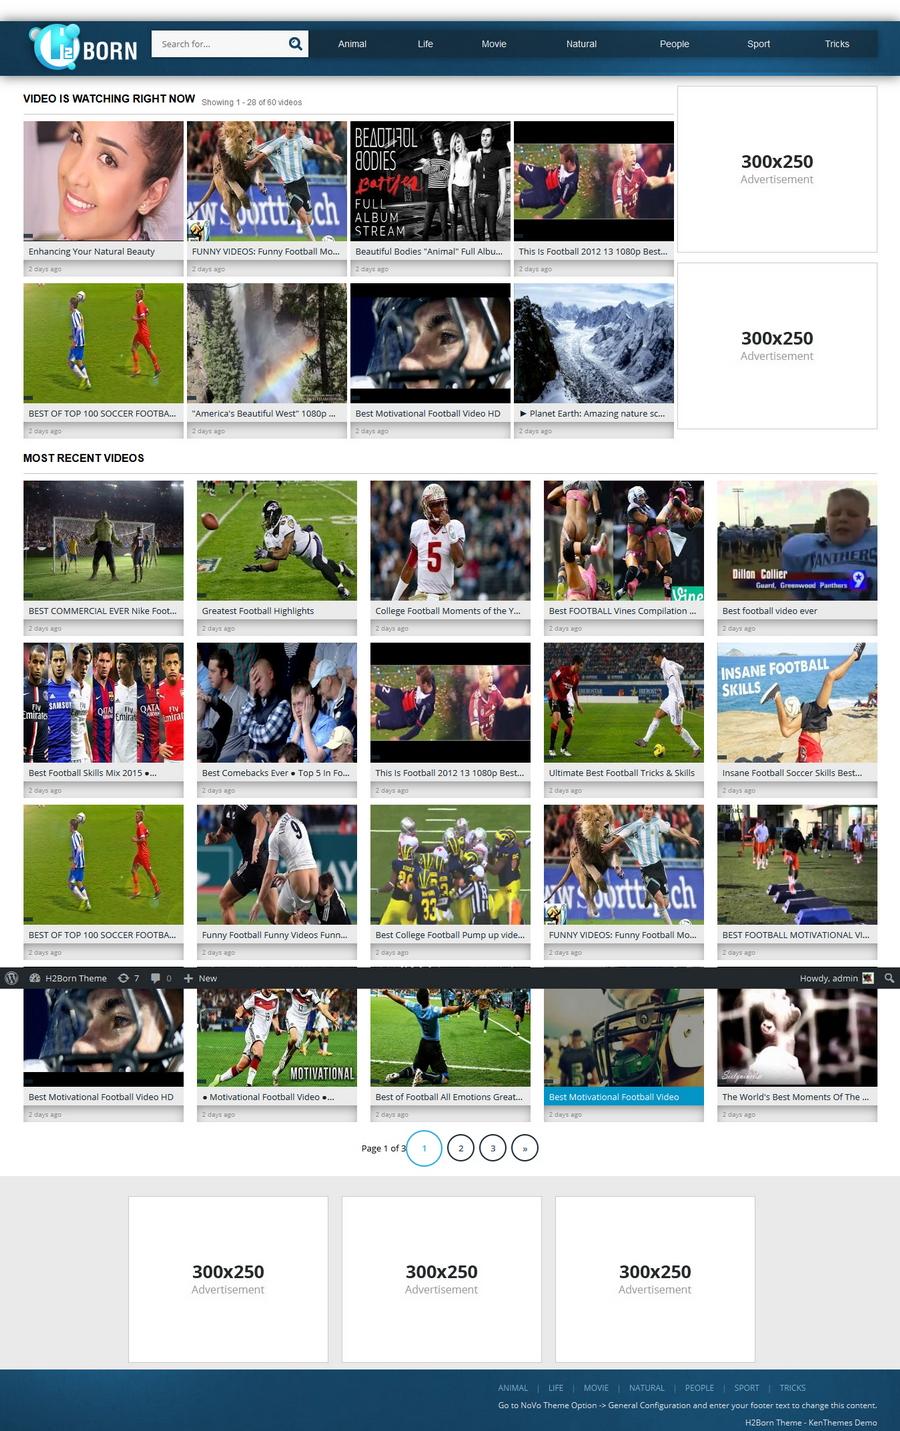 screenshot-xtubehot com 2015-01-16 22-49-24